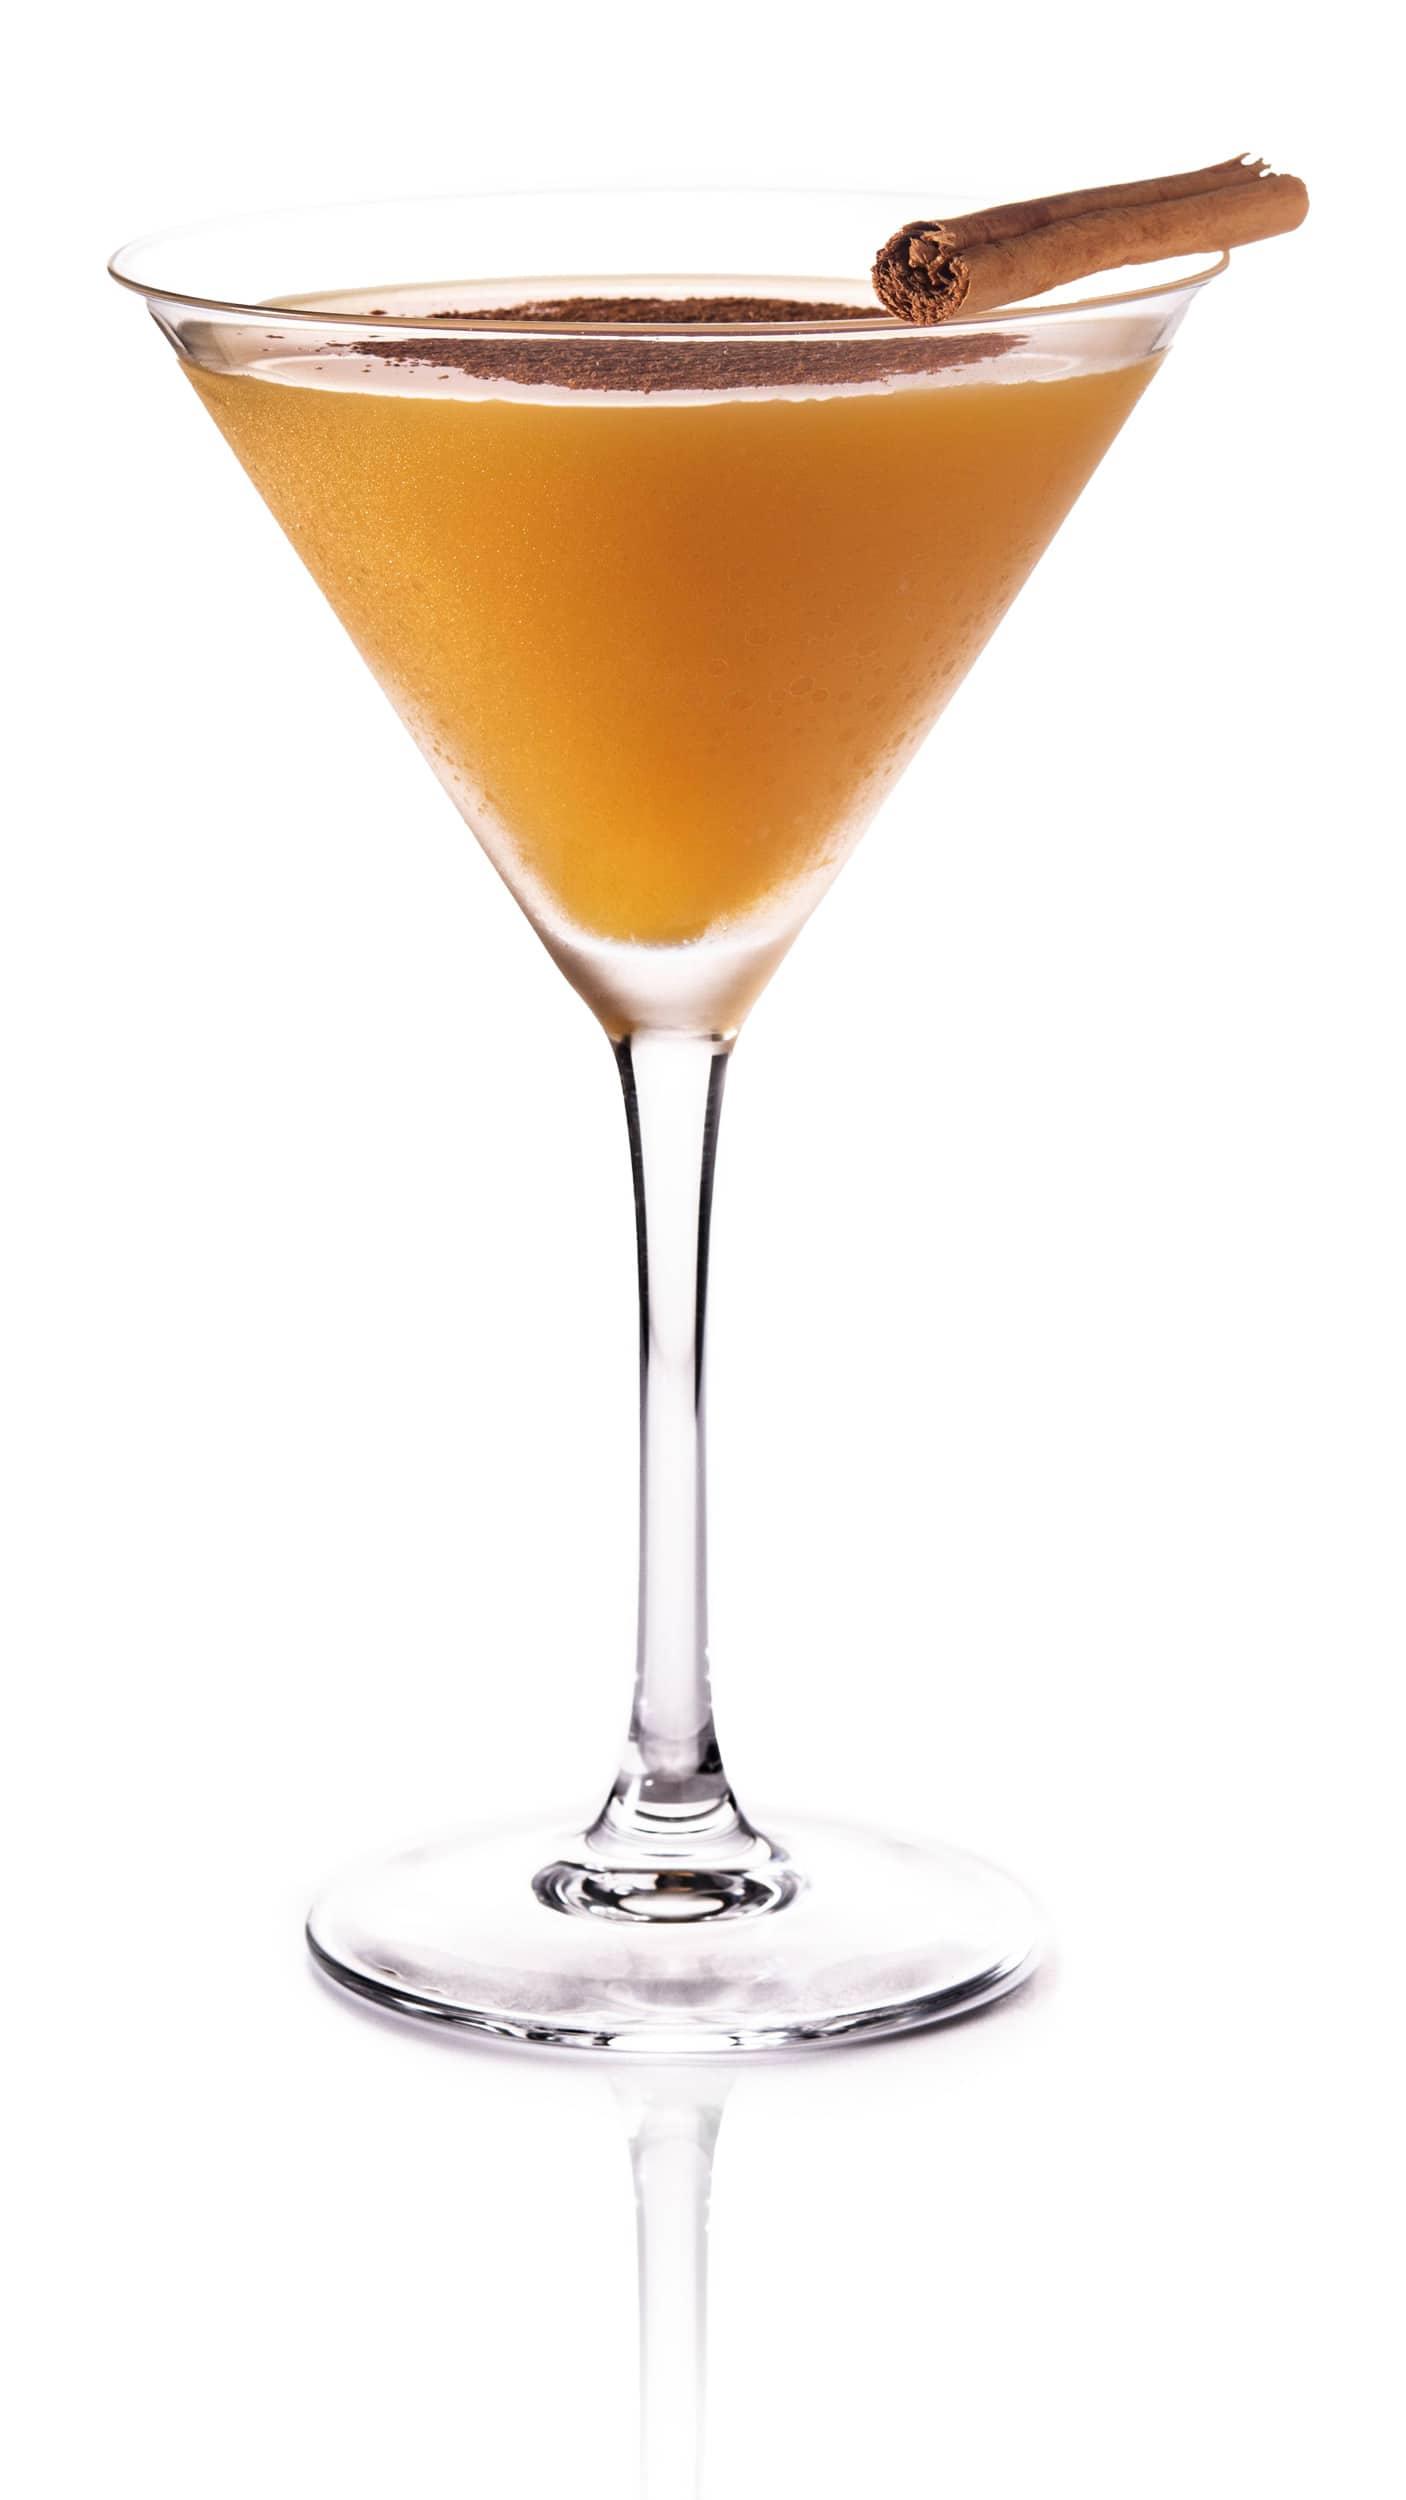 Pumpkin spice cocktail with EFFEN Original, pumpkin pie filling, fresh orange juice and cinnamon.